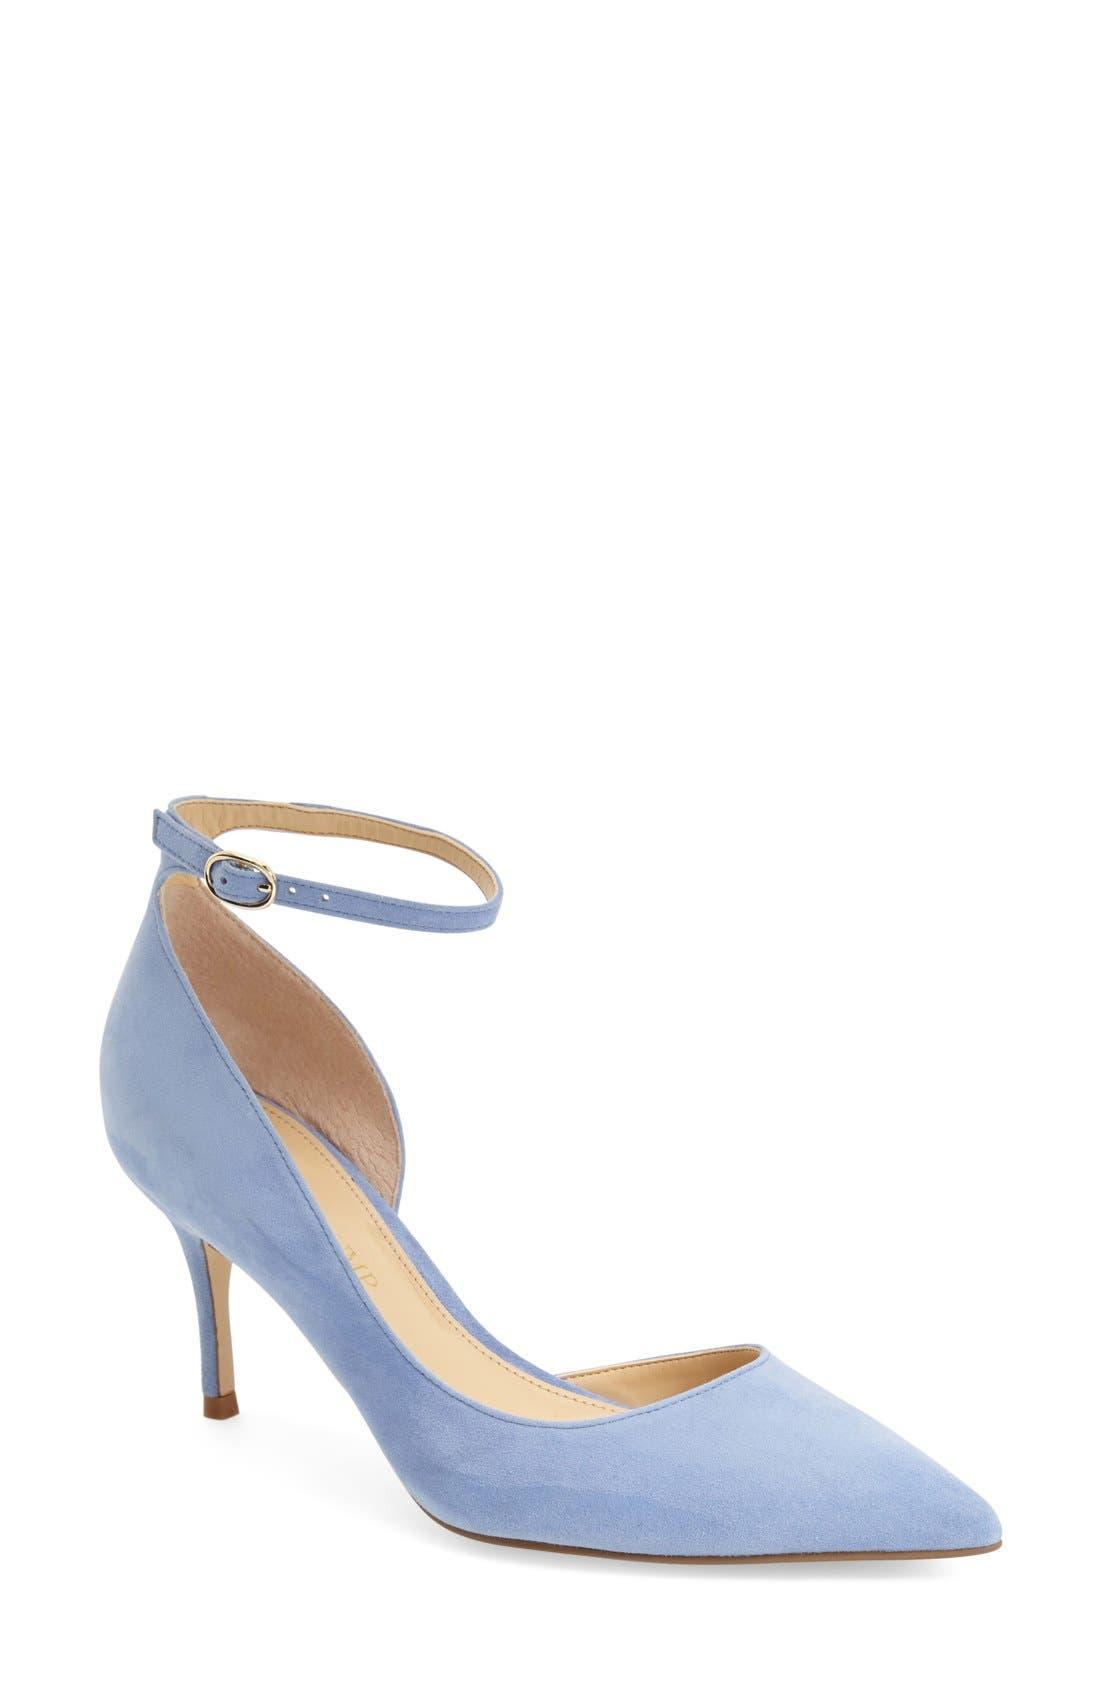 Alternate Image 1 Selected - Ivanka Trump 'Brita' Ankle Strap Pointy Toe Pump (Women)